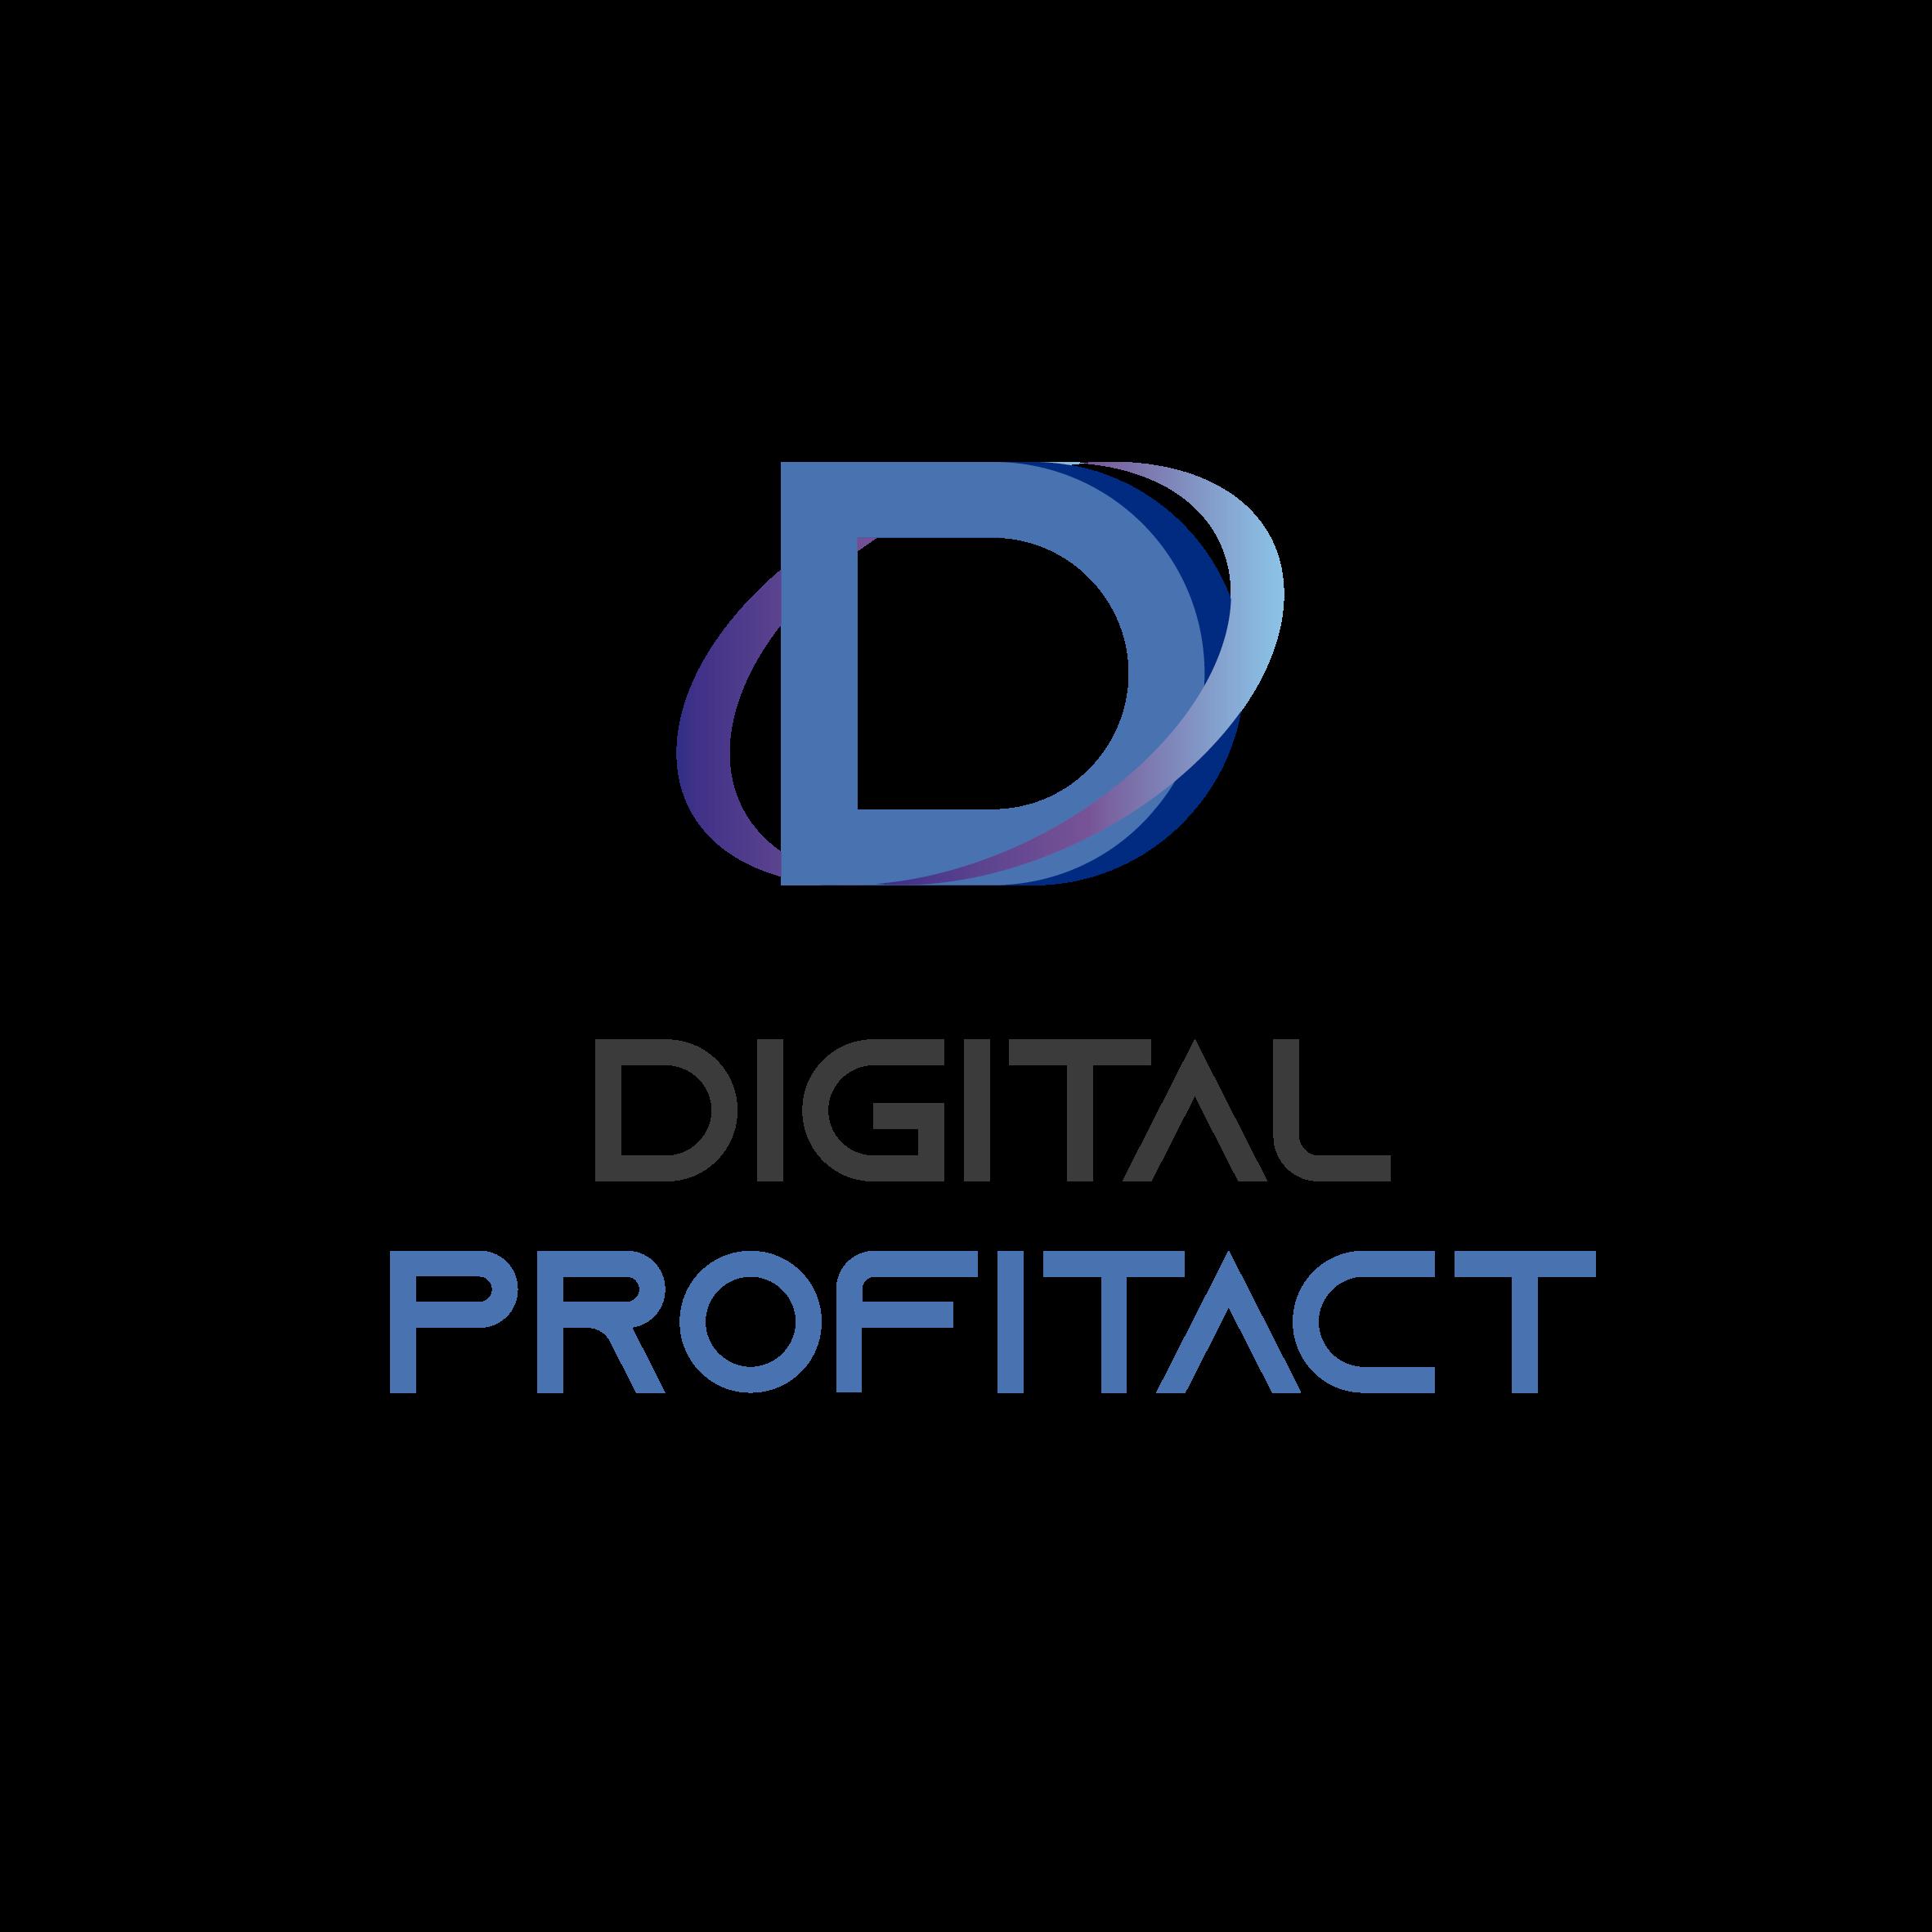 Digital profitact